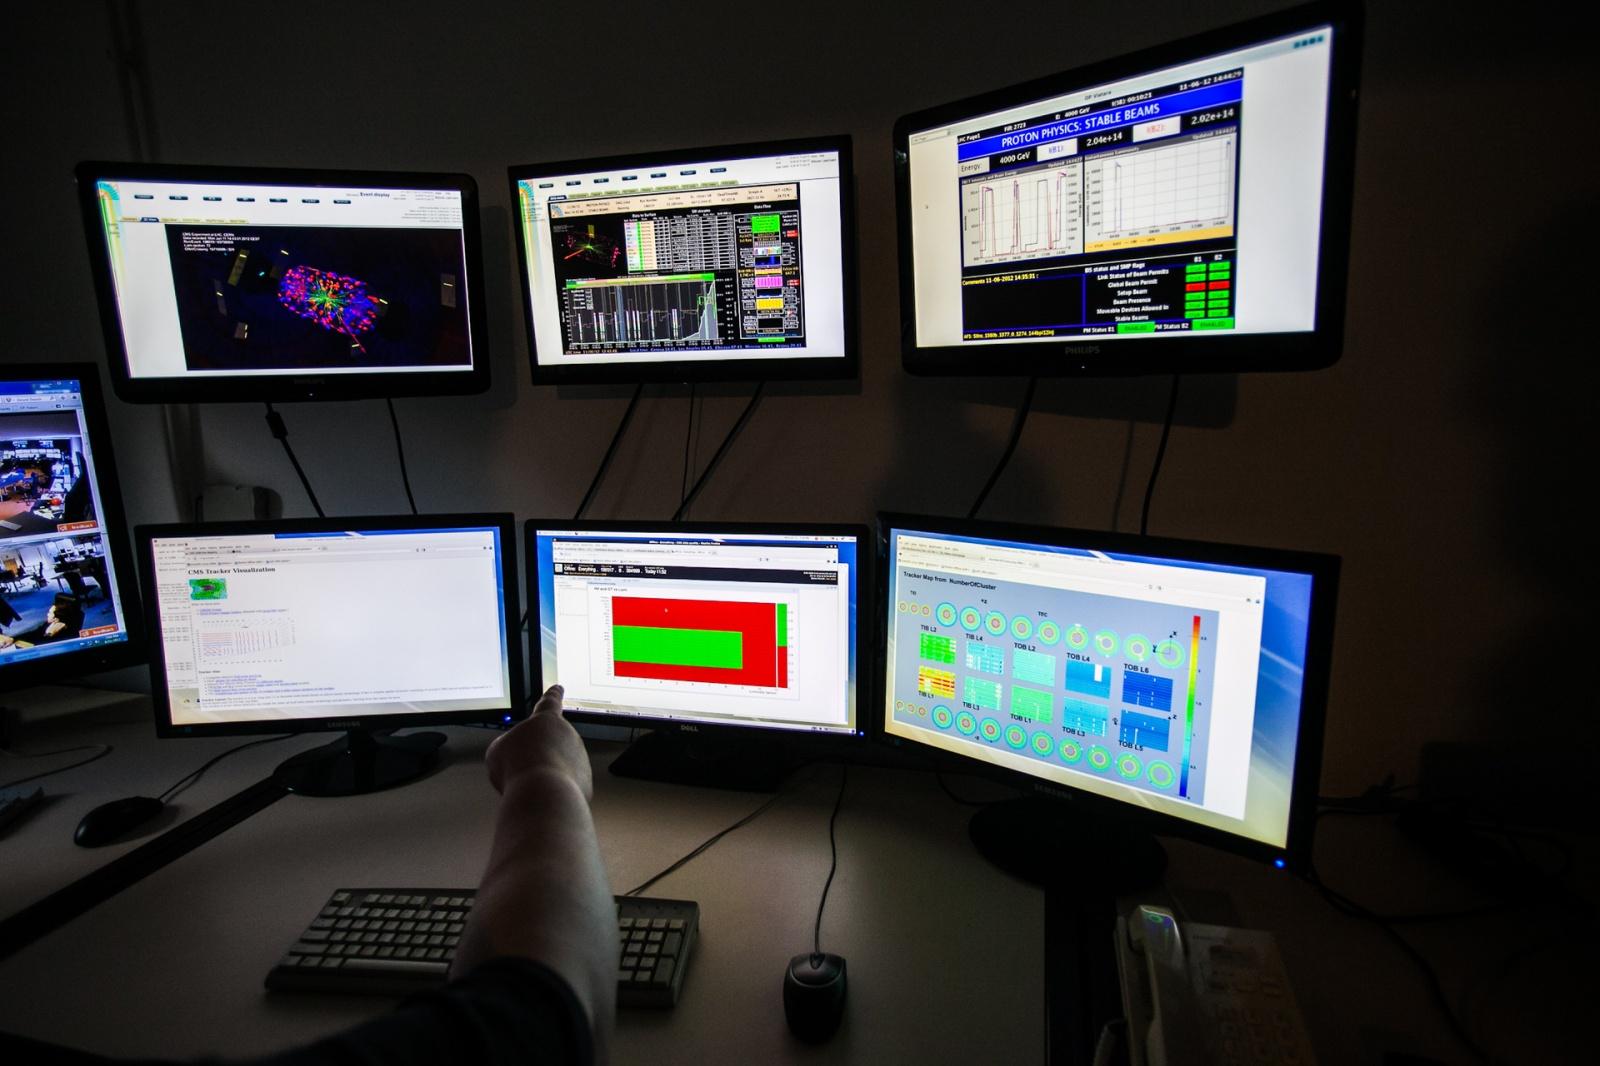 Мониторинг и система управления ЦОД - 1